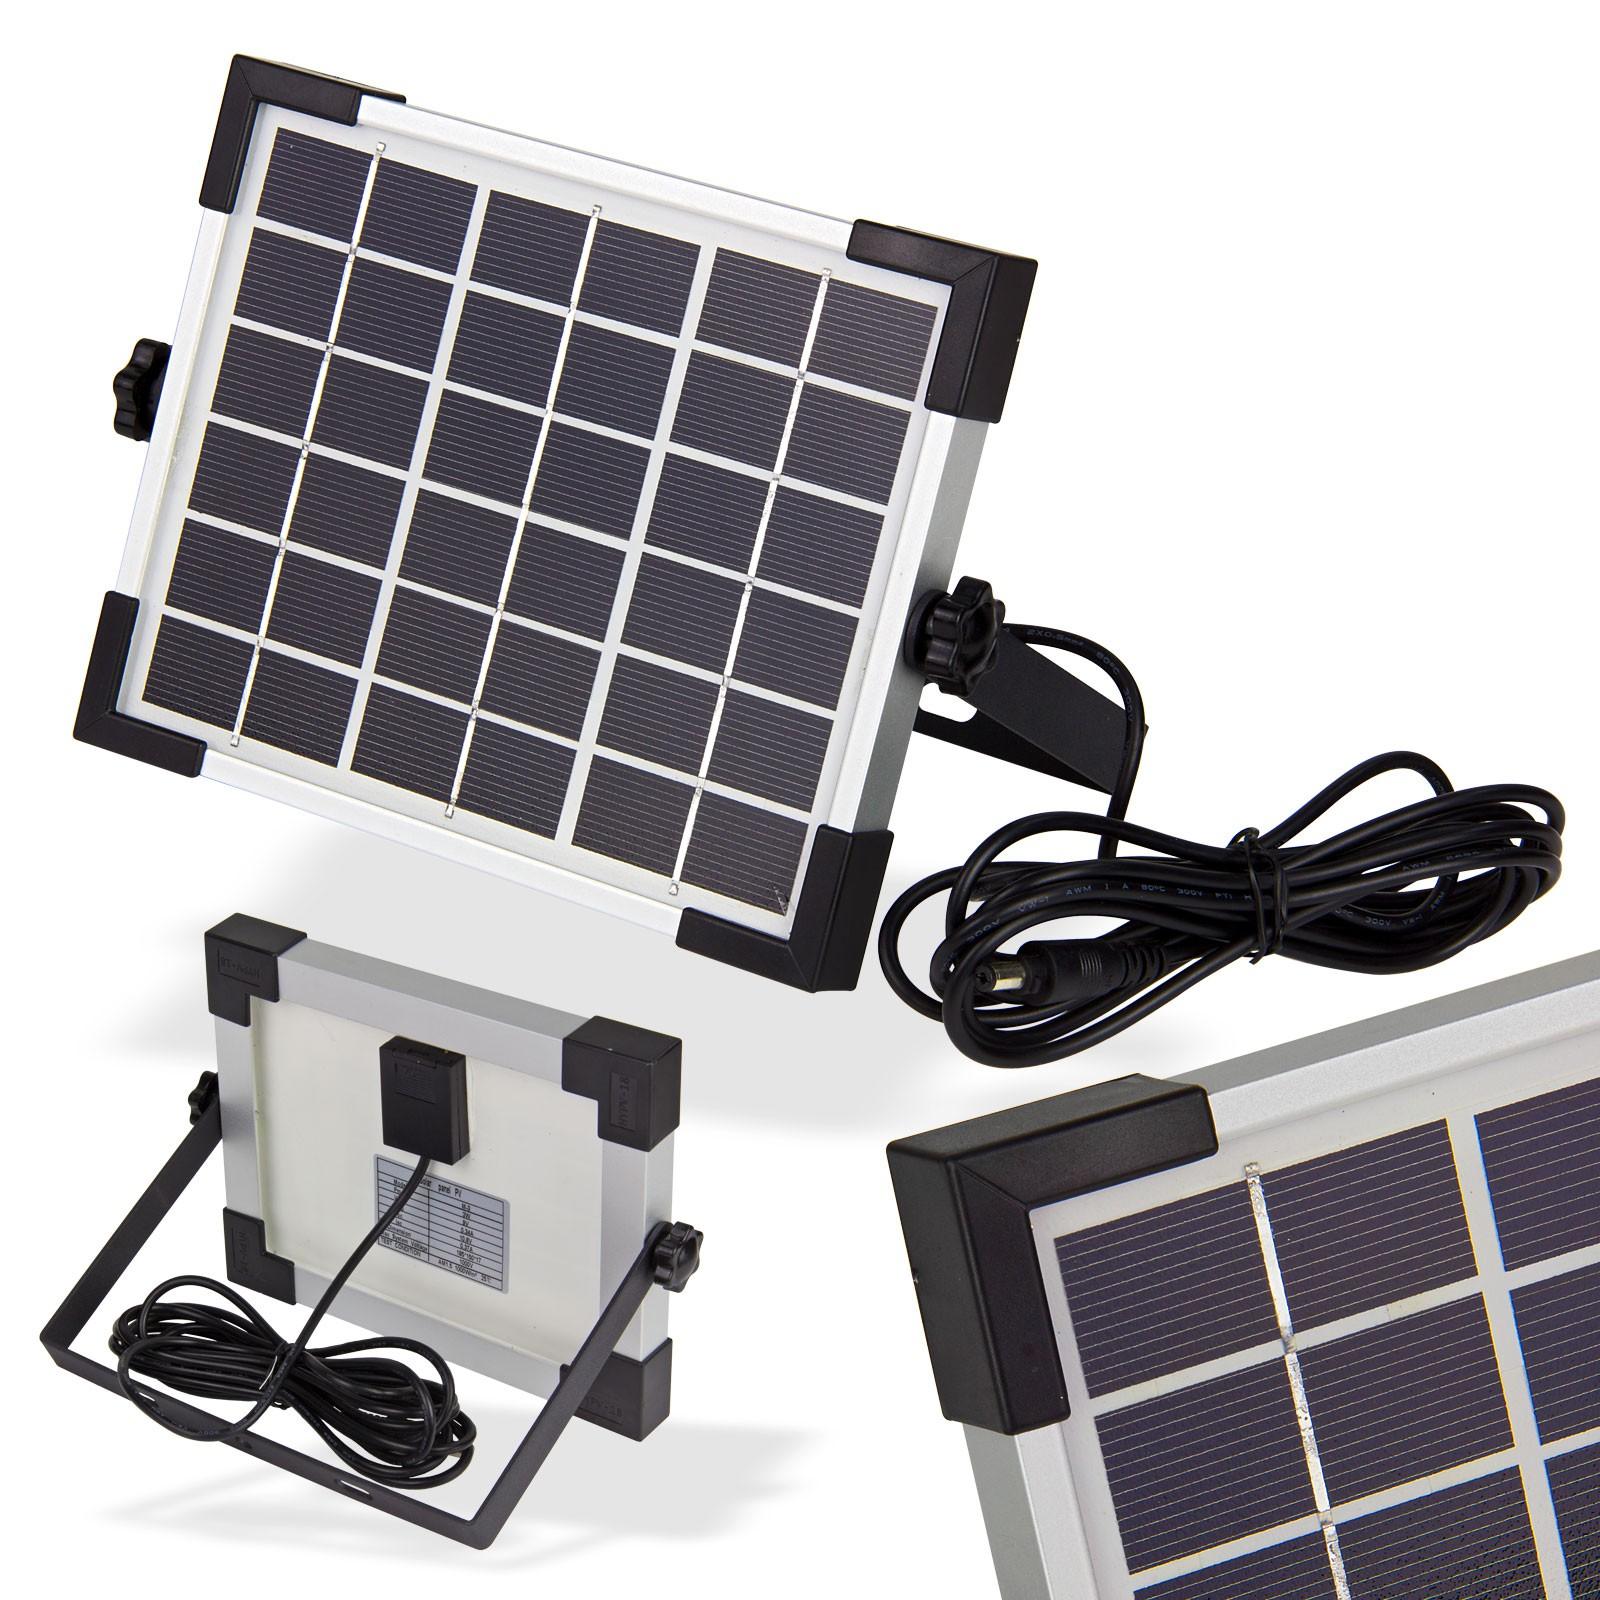 914274-Solar-LED-Strahler-mit-Bewegungsmelder-10_2 Stilvolle solar Strahler Mit Bewegungsmelder Dekorationen